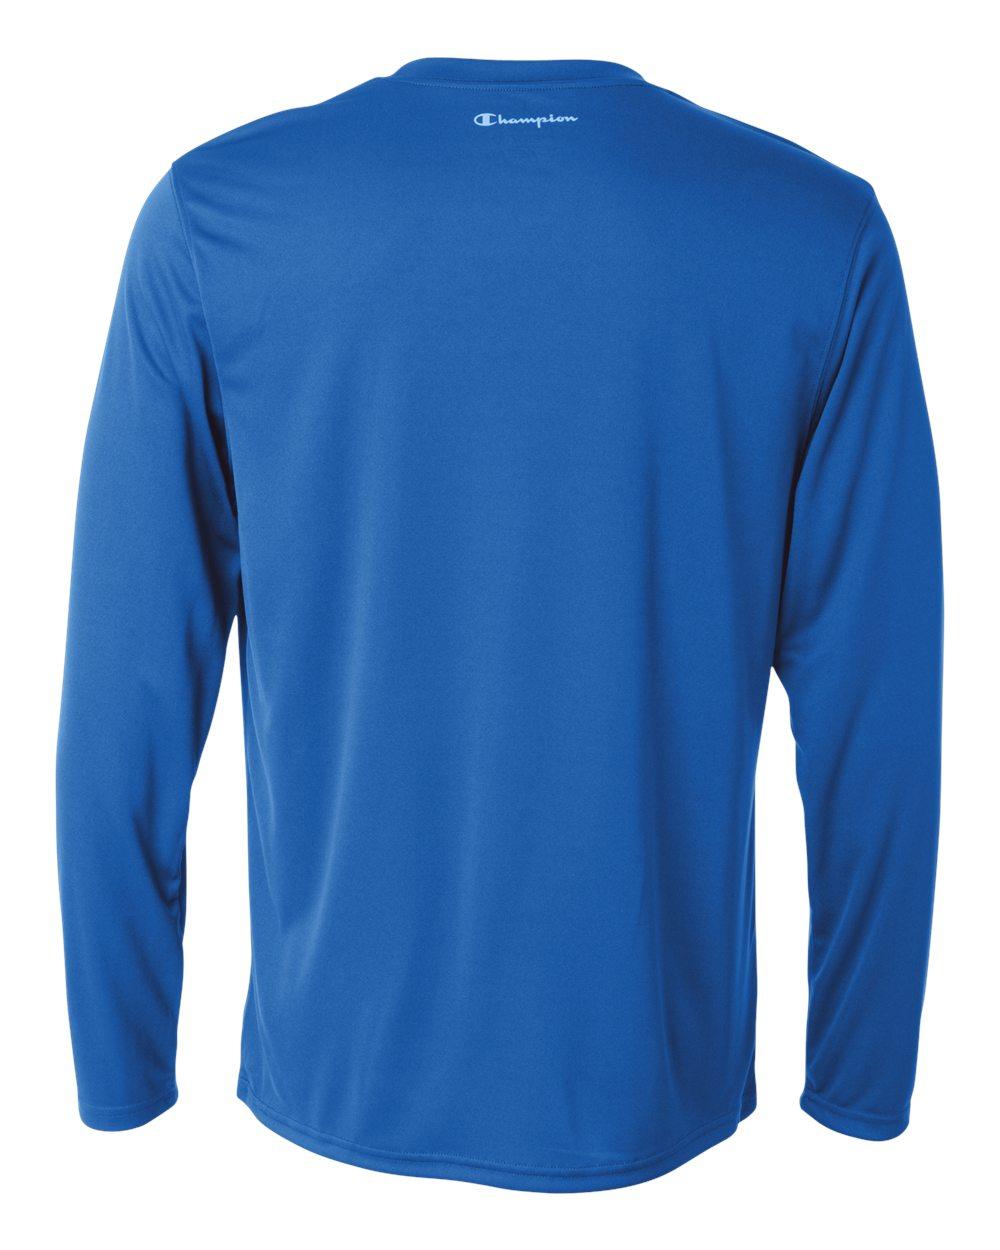 Champion-Men-039-s-Double-Dry-4-1-oz-Long-Sleeve-Interlock-T-Shirt-CW26-XS-3XL thumbnail 20